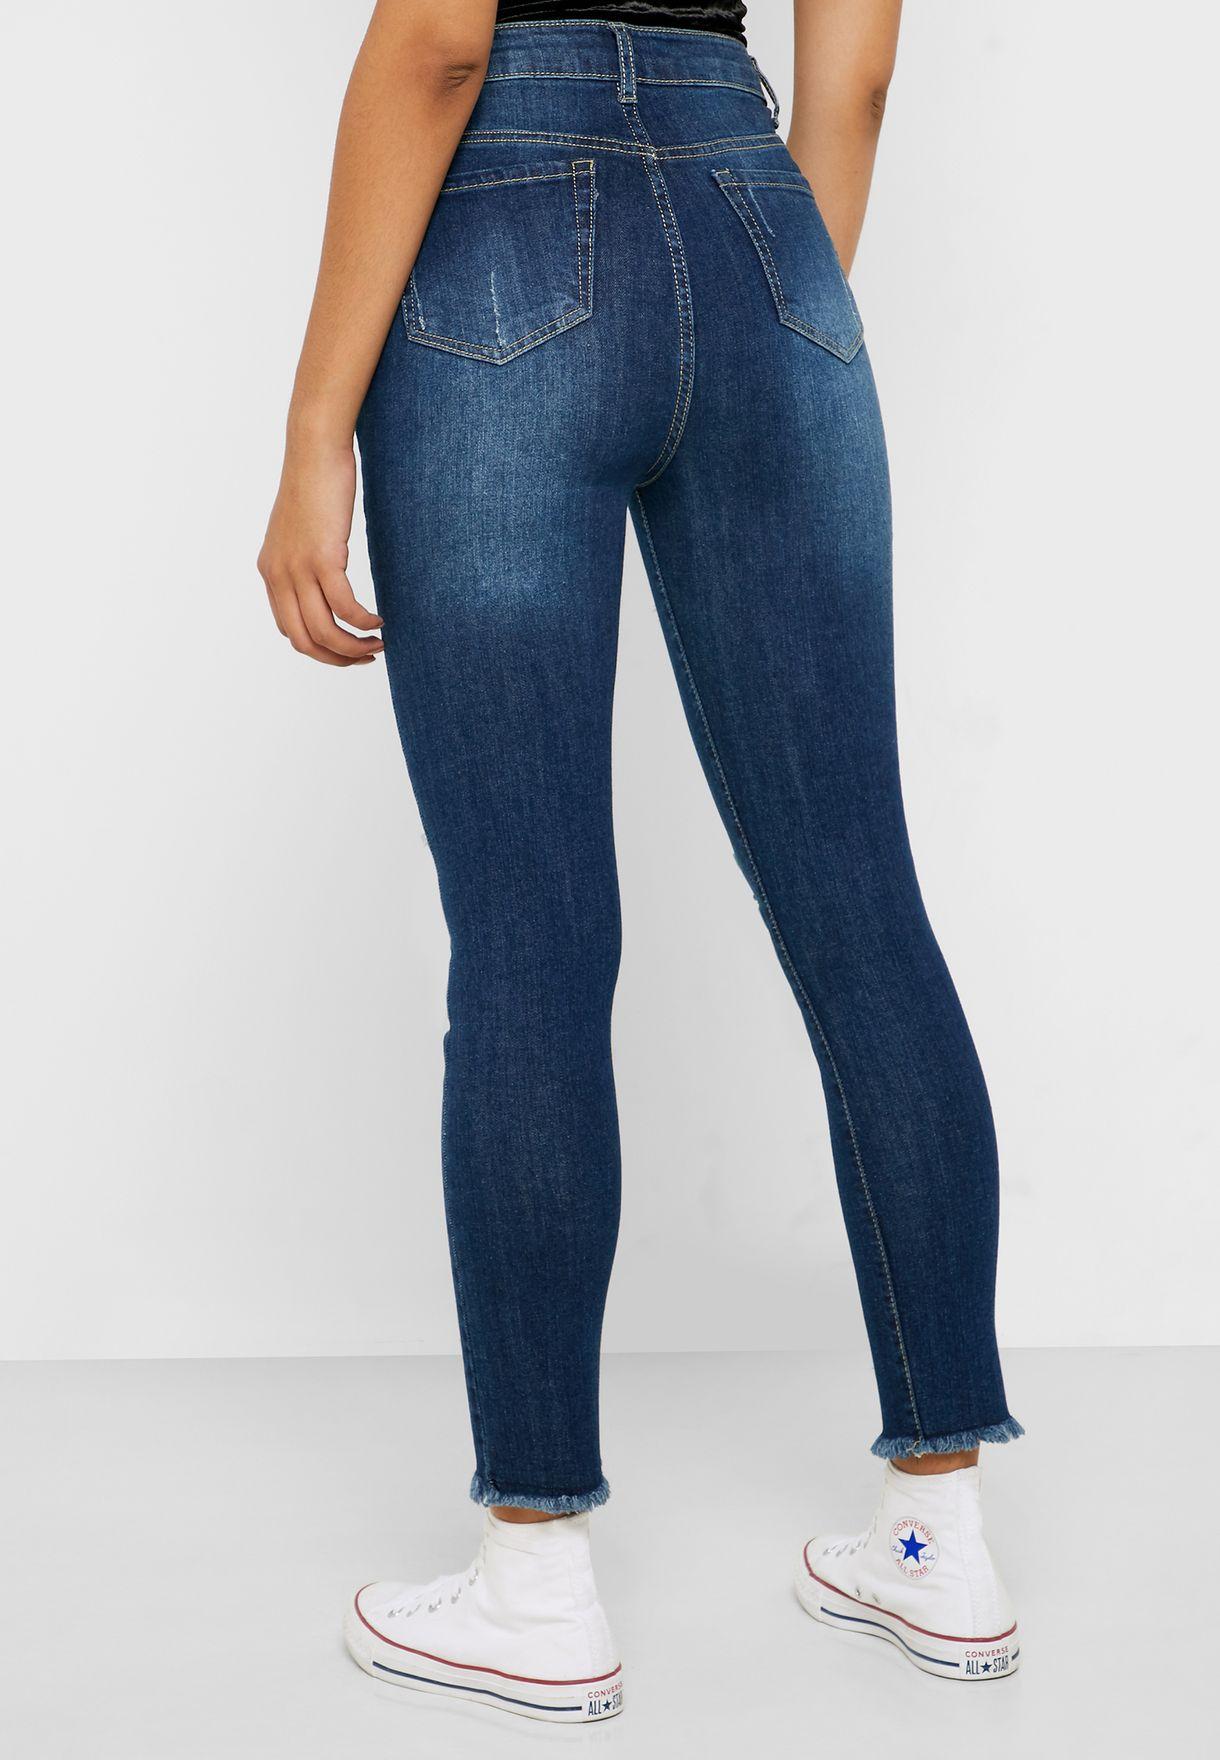 Distressed High Waist Skinny Jeans